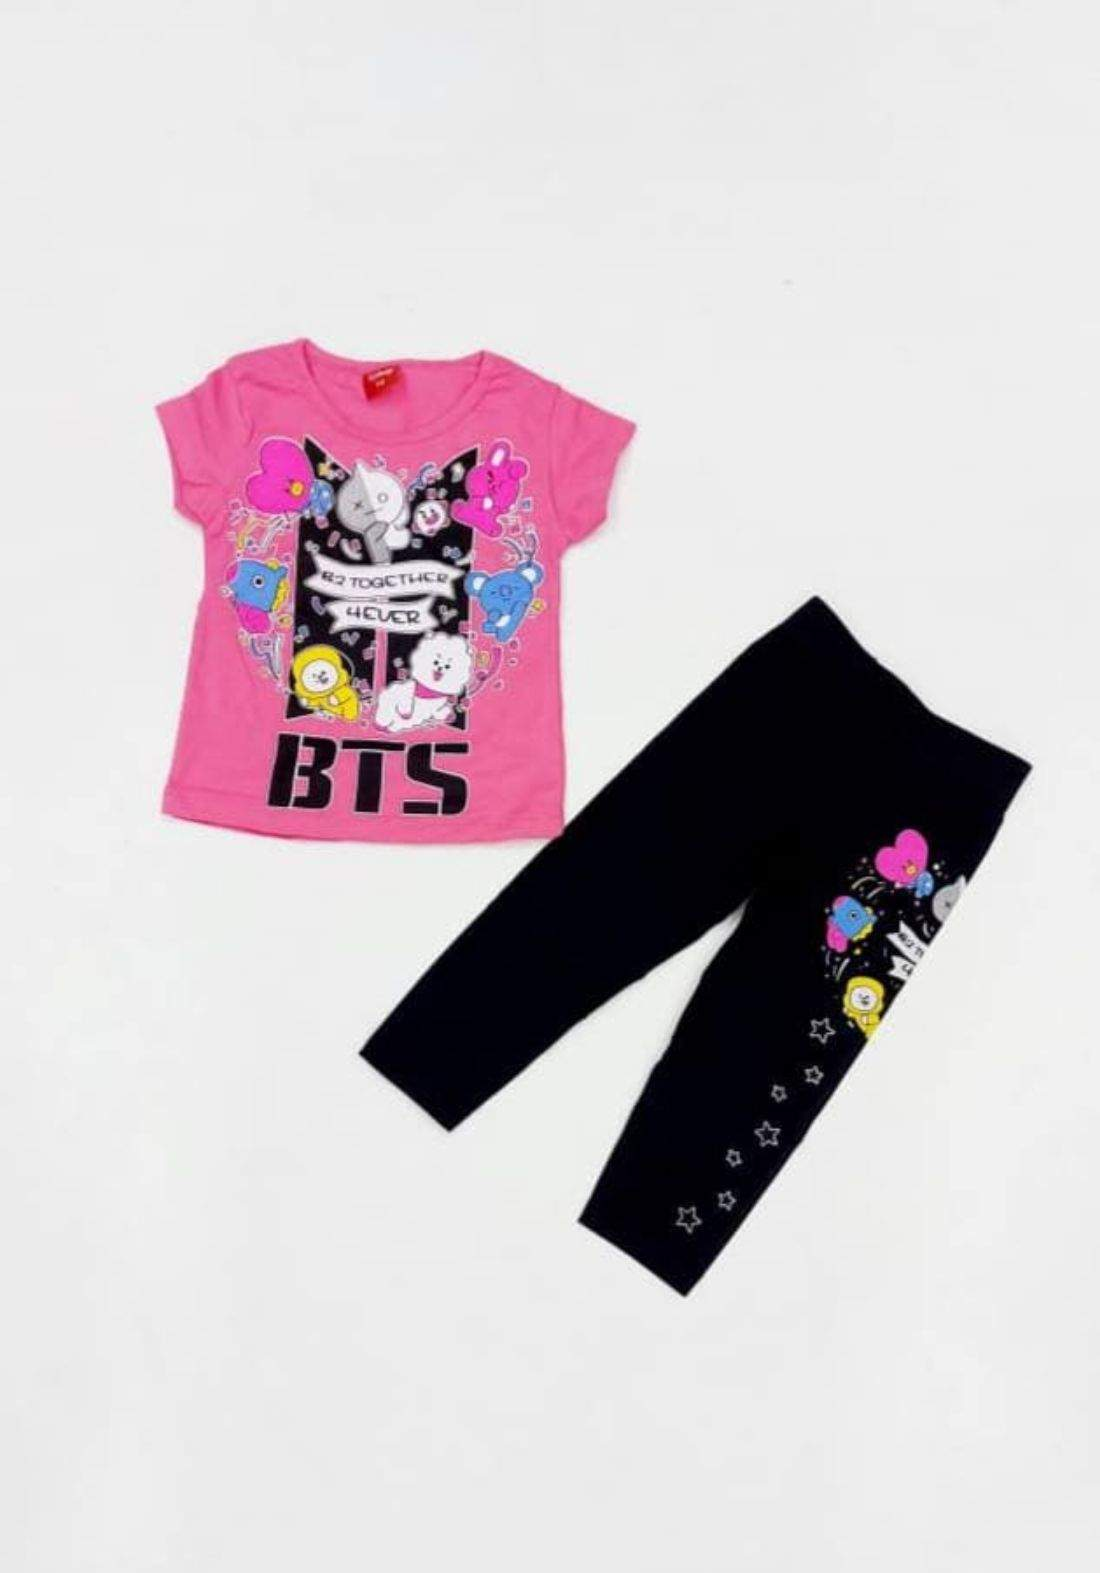 Tracksuit for girls pink  (t-shirt+pijamas) تراكسوت بناتي وردي  ,(بجامة+تيشيرت)